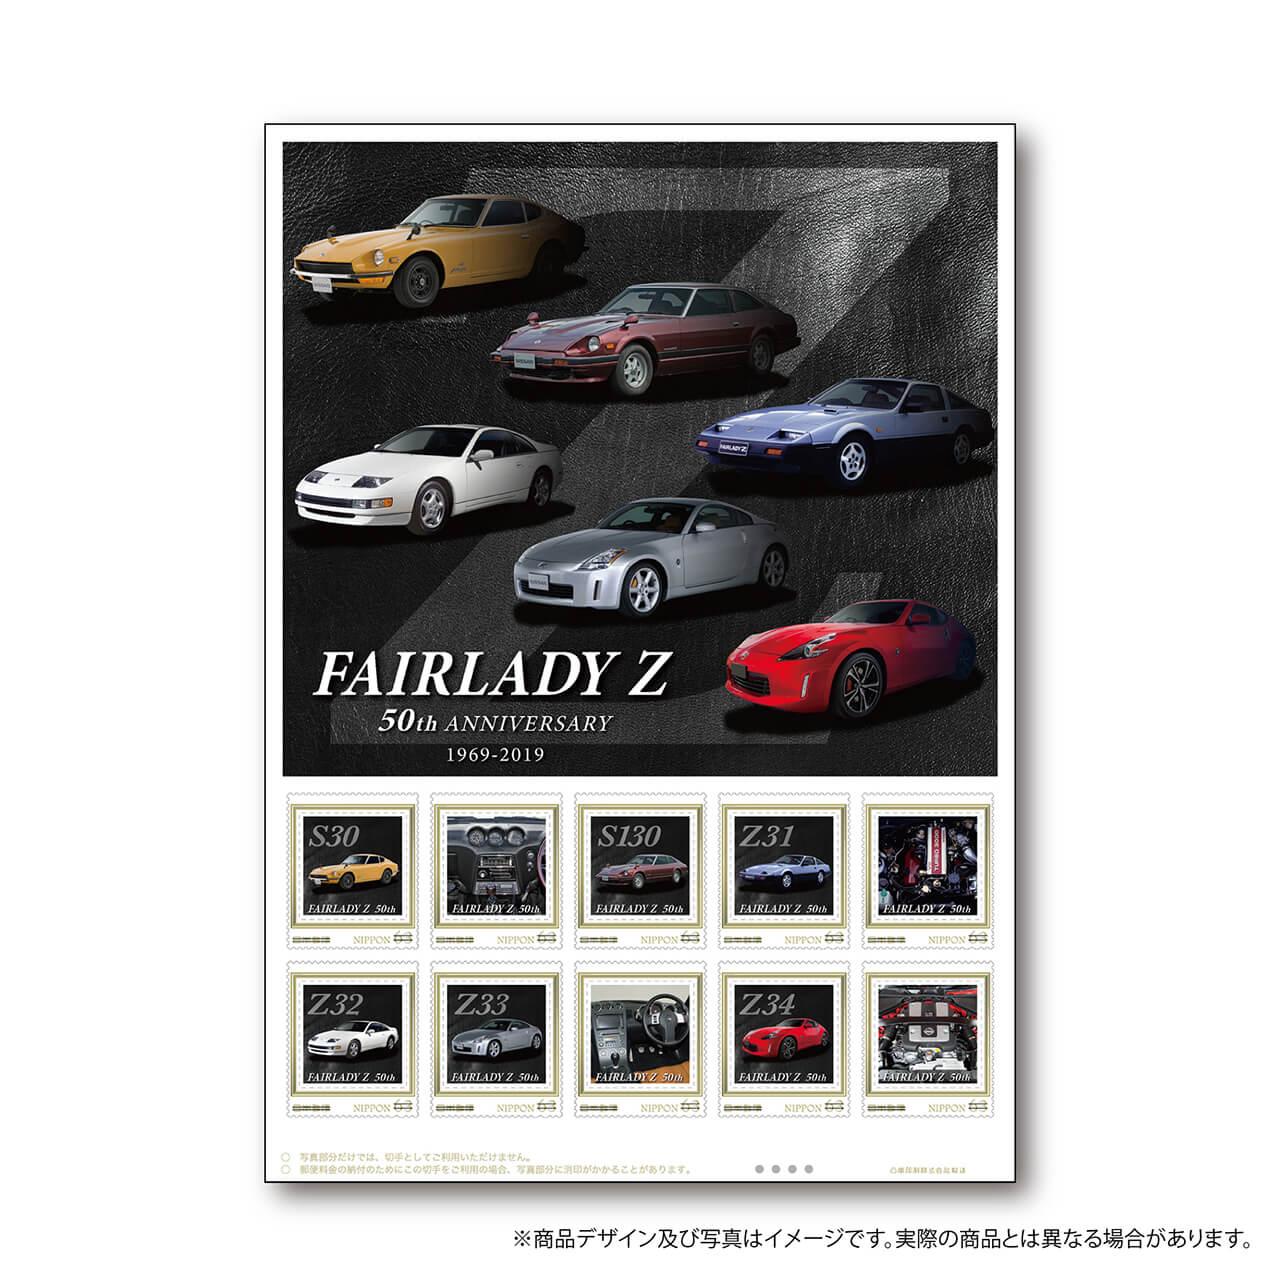 「Z」からでも半世紀! 「日産フェアレディZ」の誕生50周年を記念した切手セットが販売開始